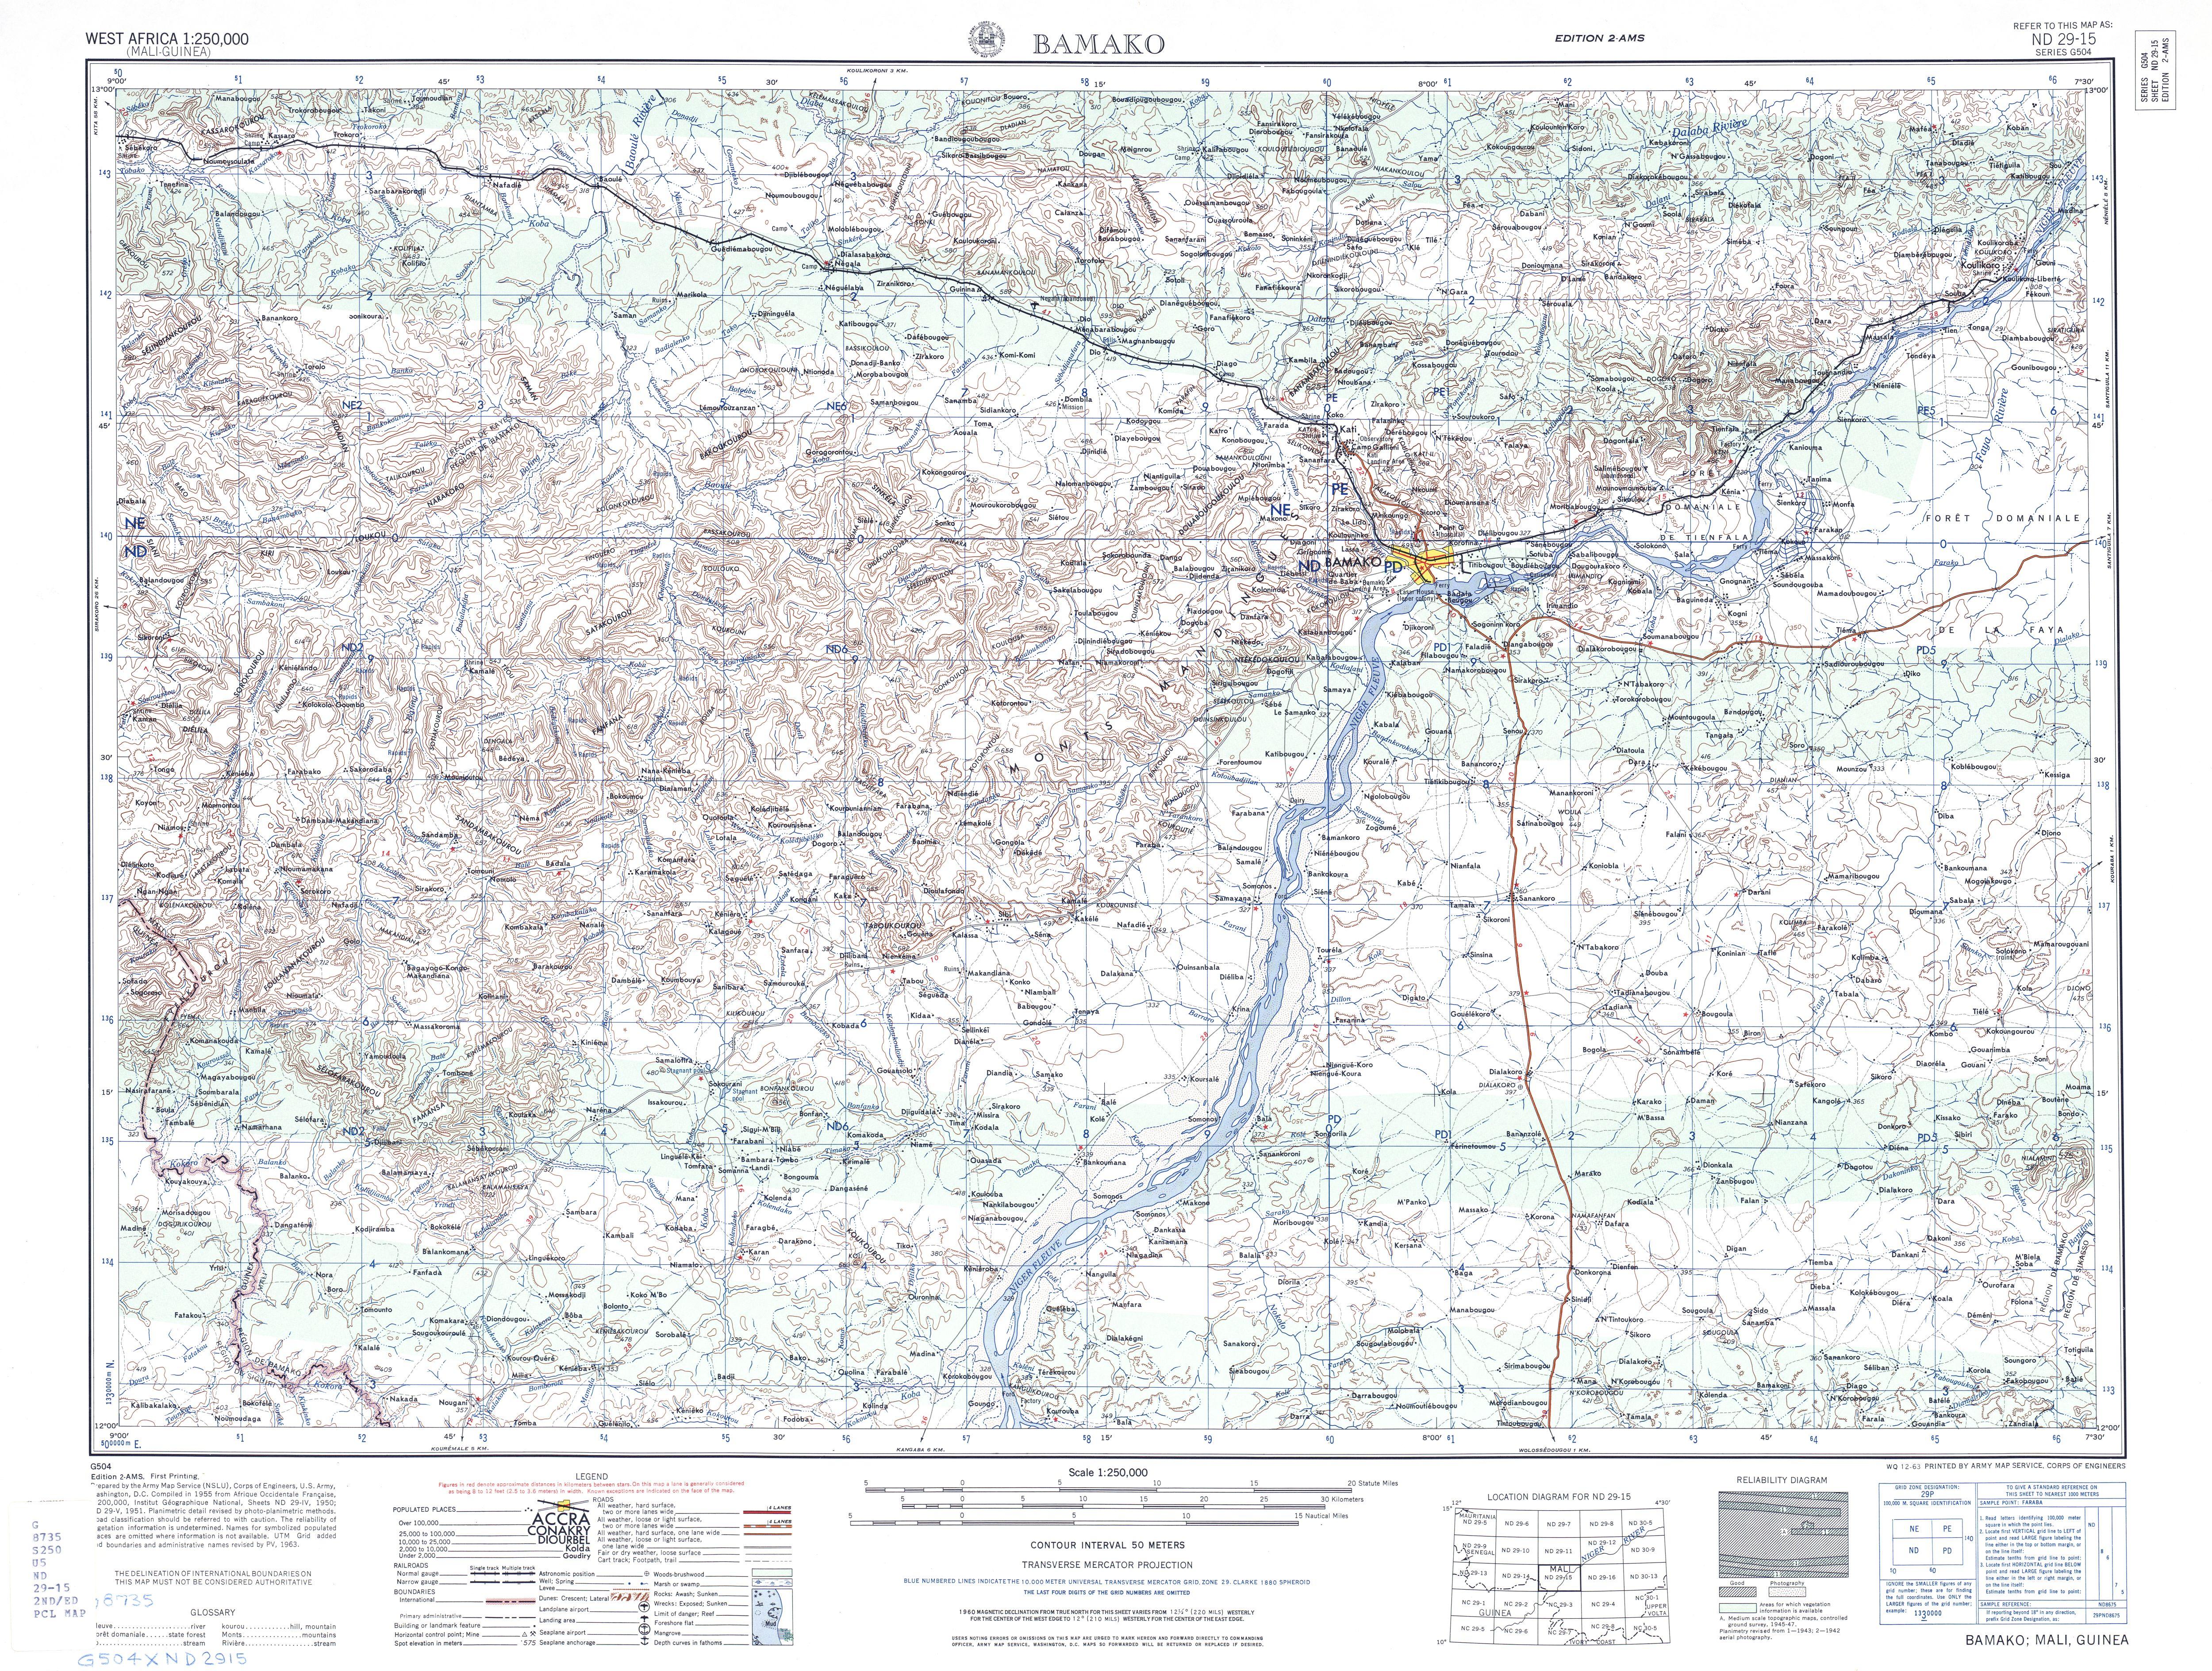 Bamako Topographic Map Sheet, Western Africa 1955